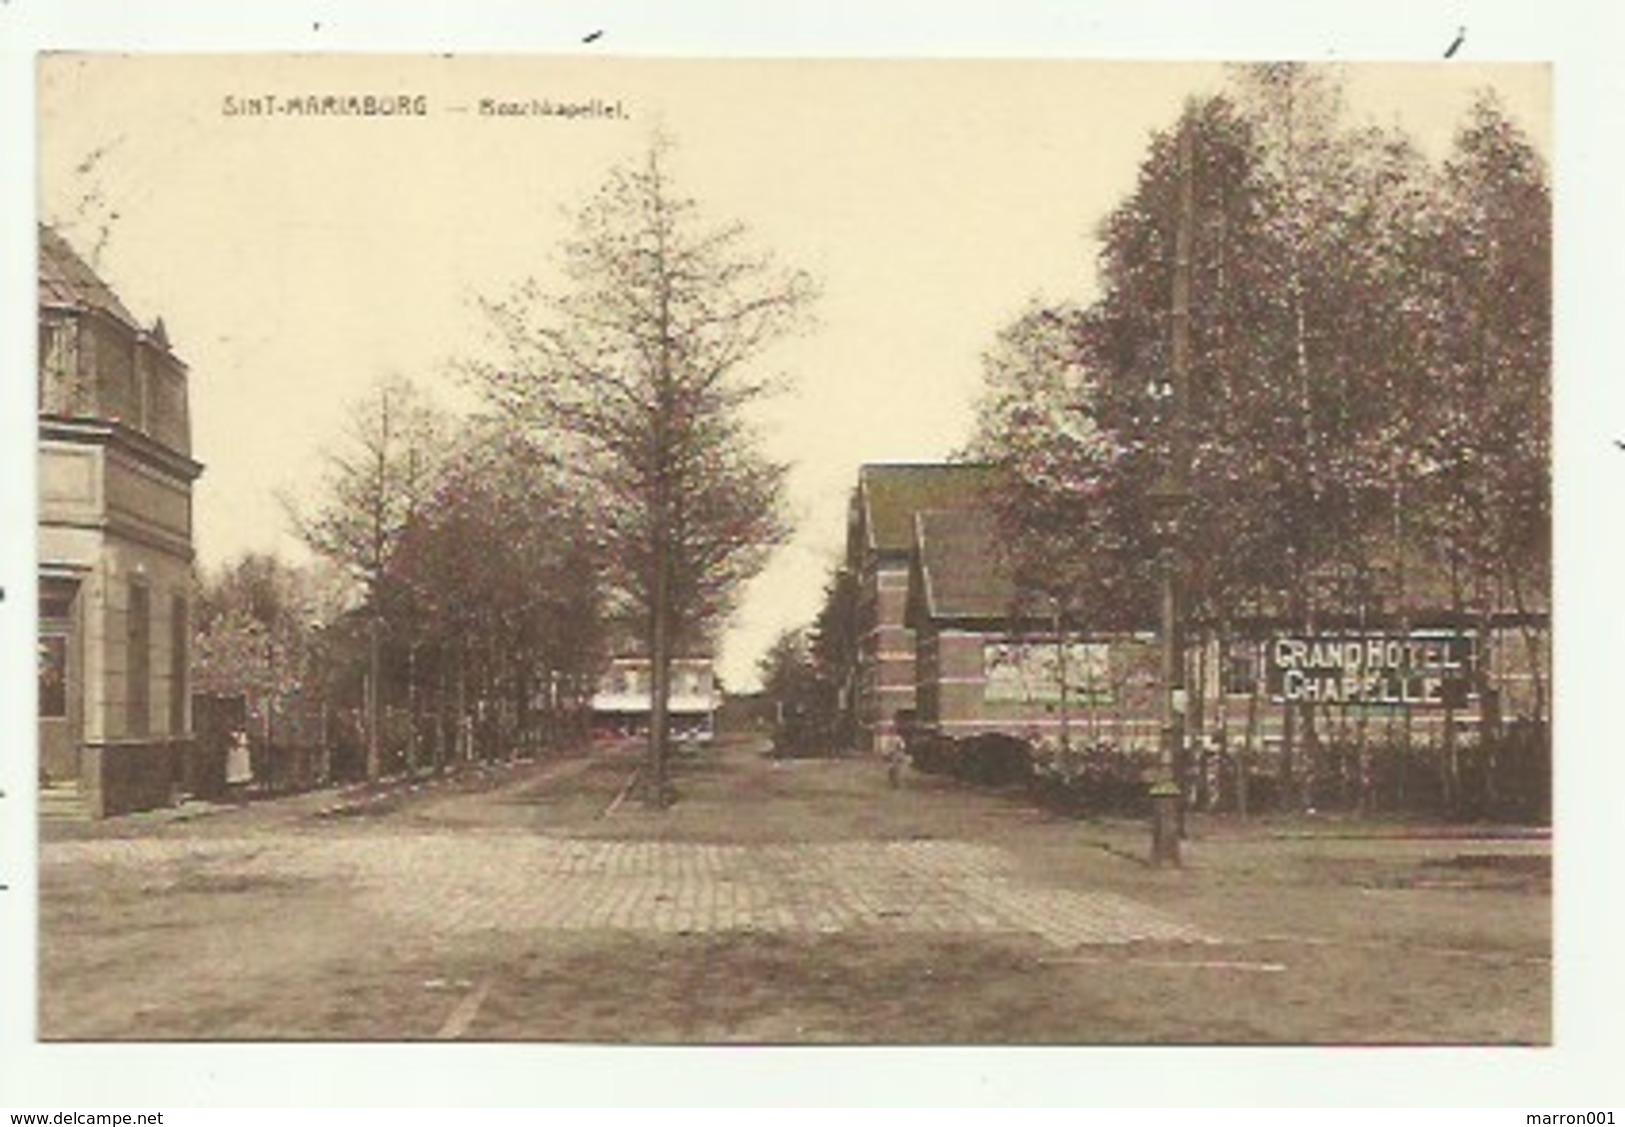 Sint - Mariaburg - Boschkapellei - Verzonden 19?? - Antwerpen